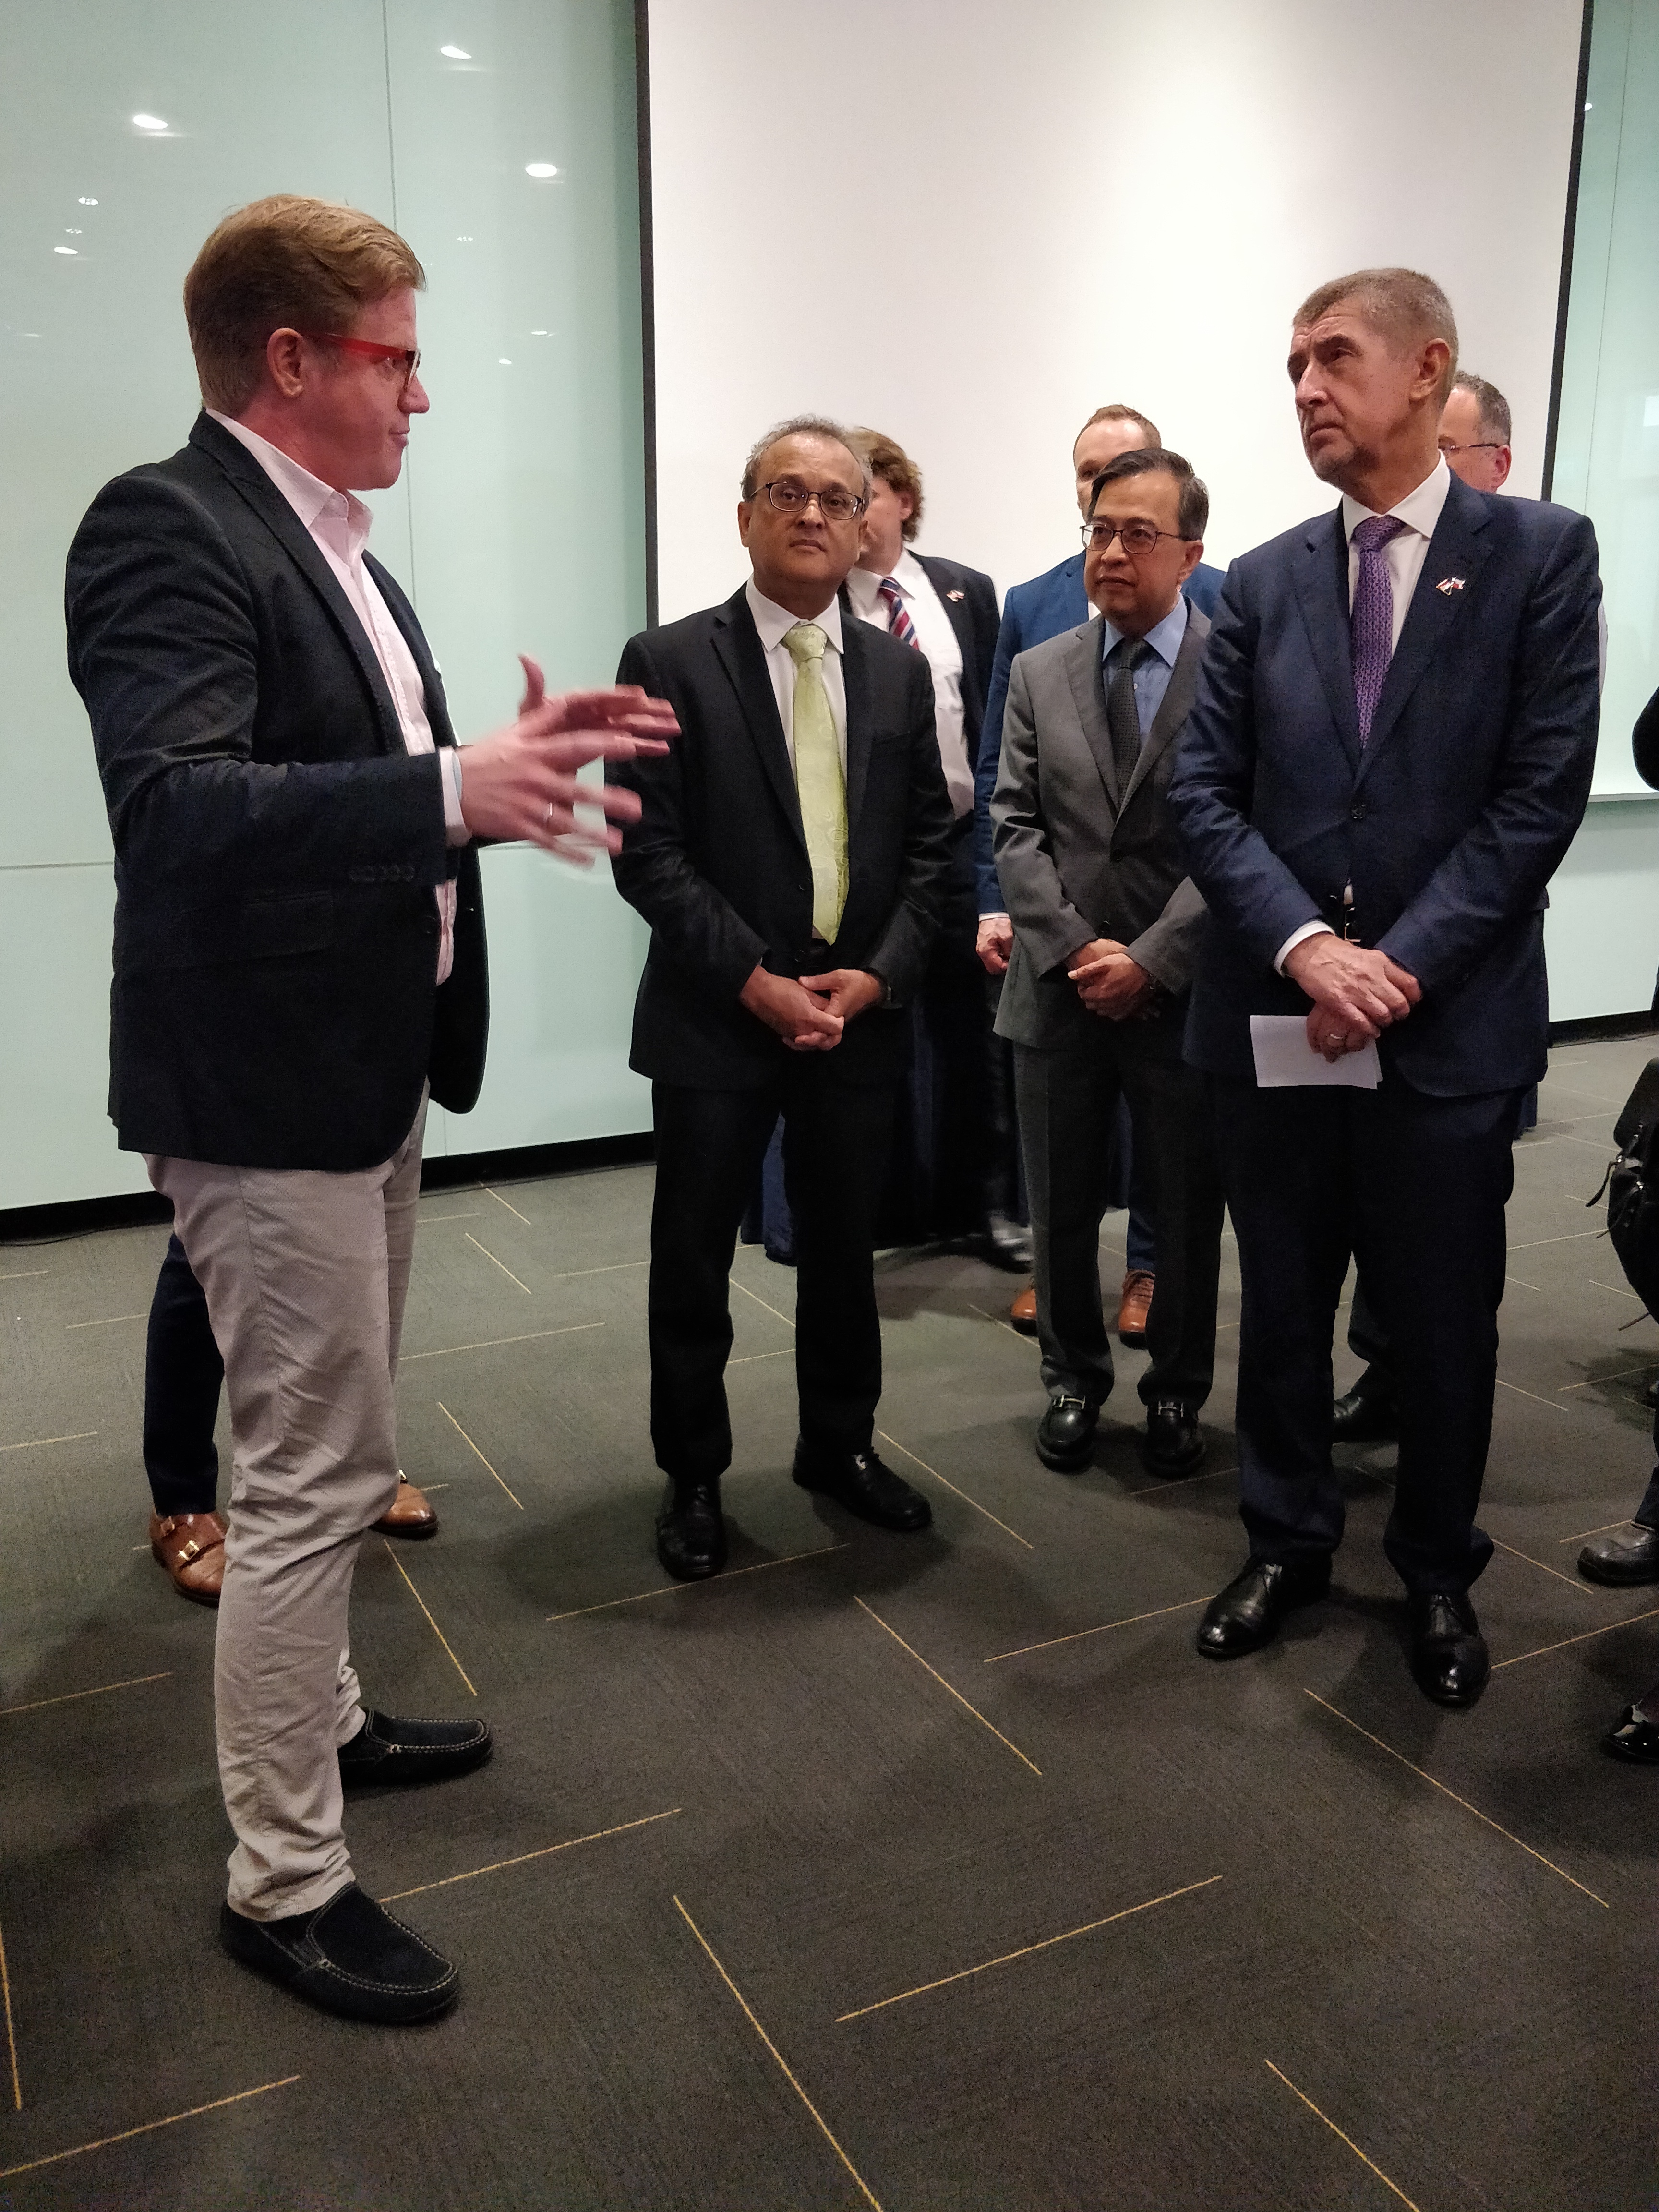 Czech Prime Minister Visit to NTU